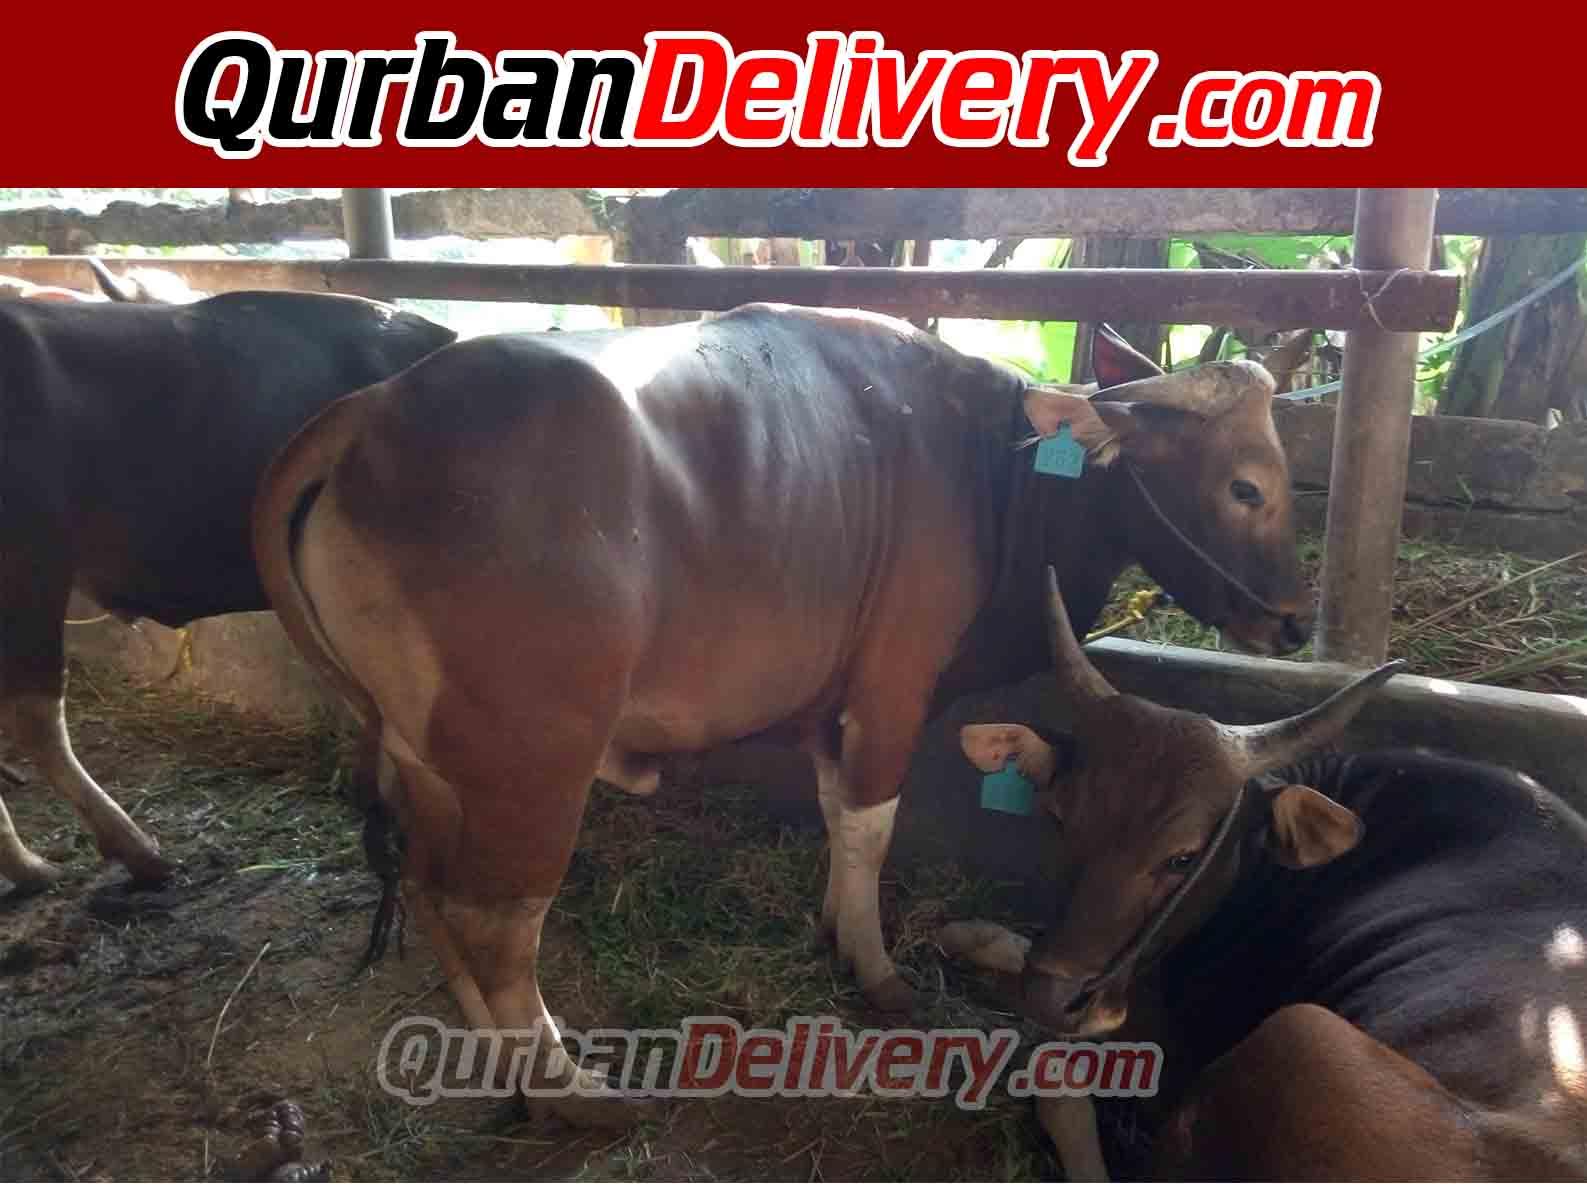 Harga Sapi Limosin Qurban Di Tangerang Prediksi 2020-Qurban Delivery